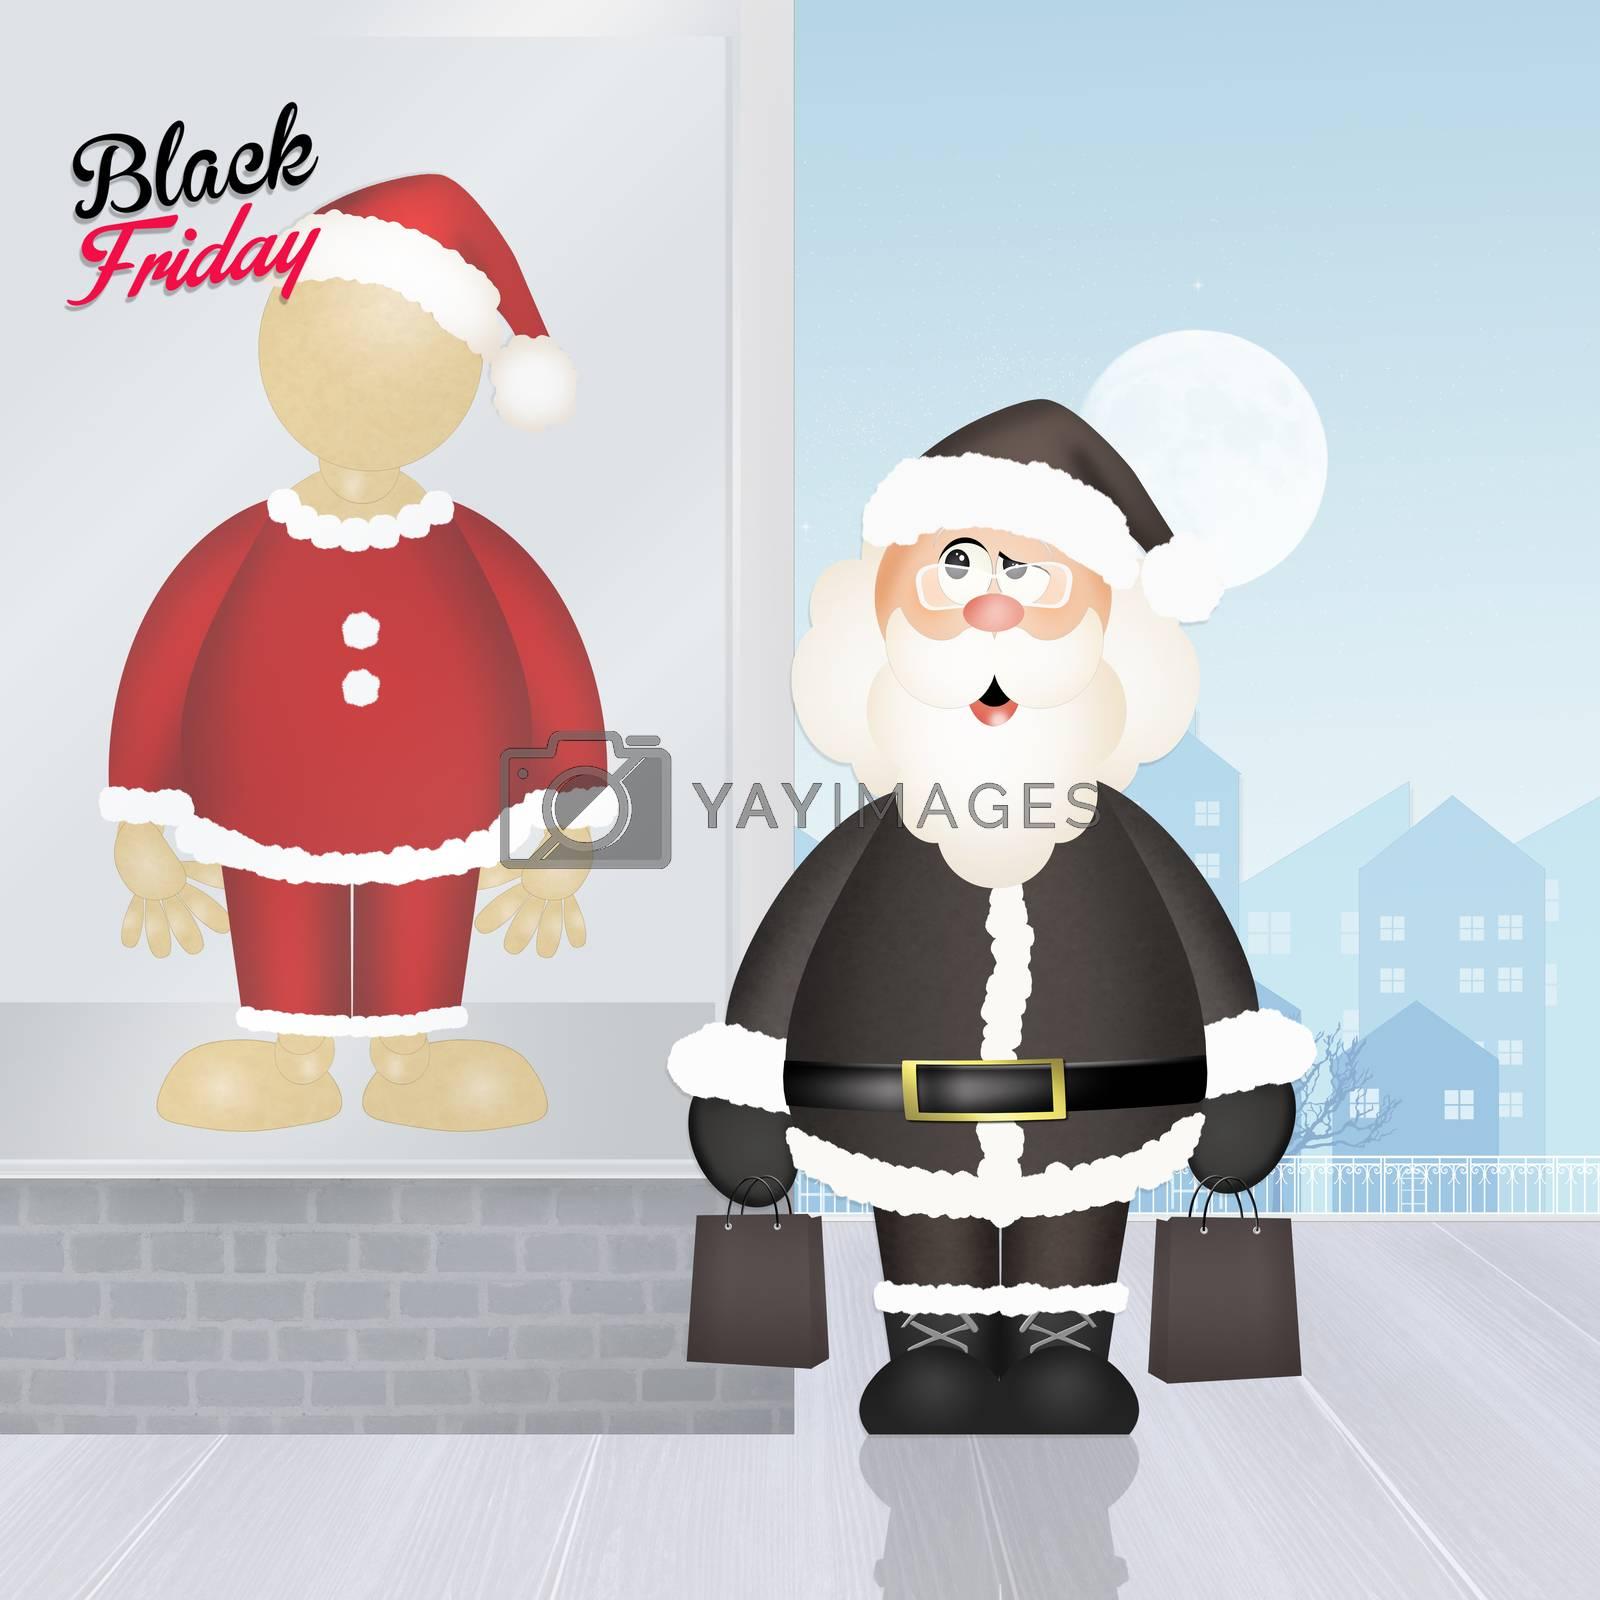 illustration of Black friday Christmas